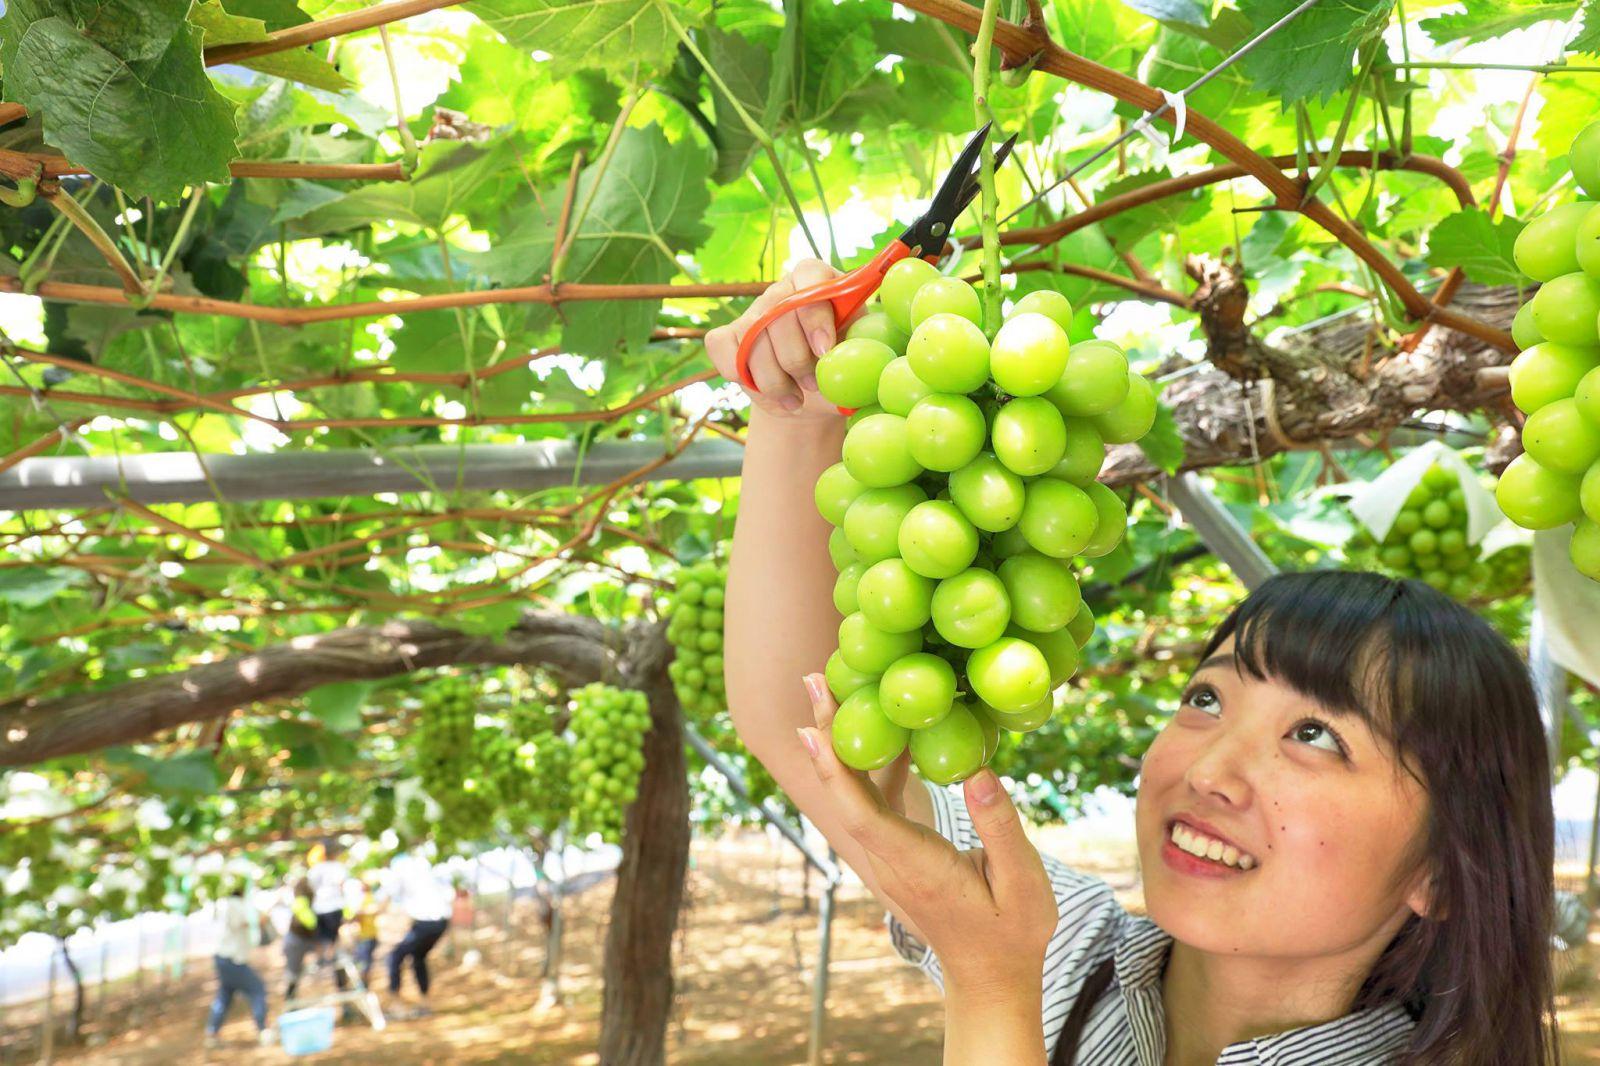 Nho Mẫu Đơn Shine Muscat Okayama Nhật Bản - MP Fruit